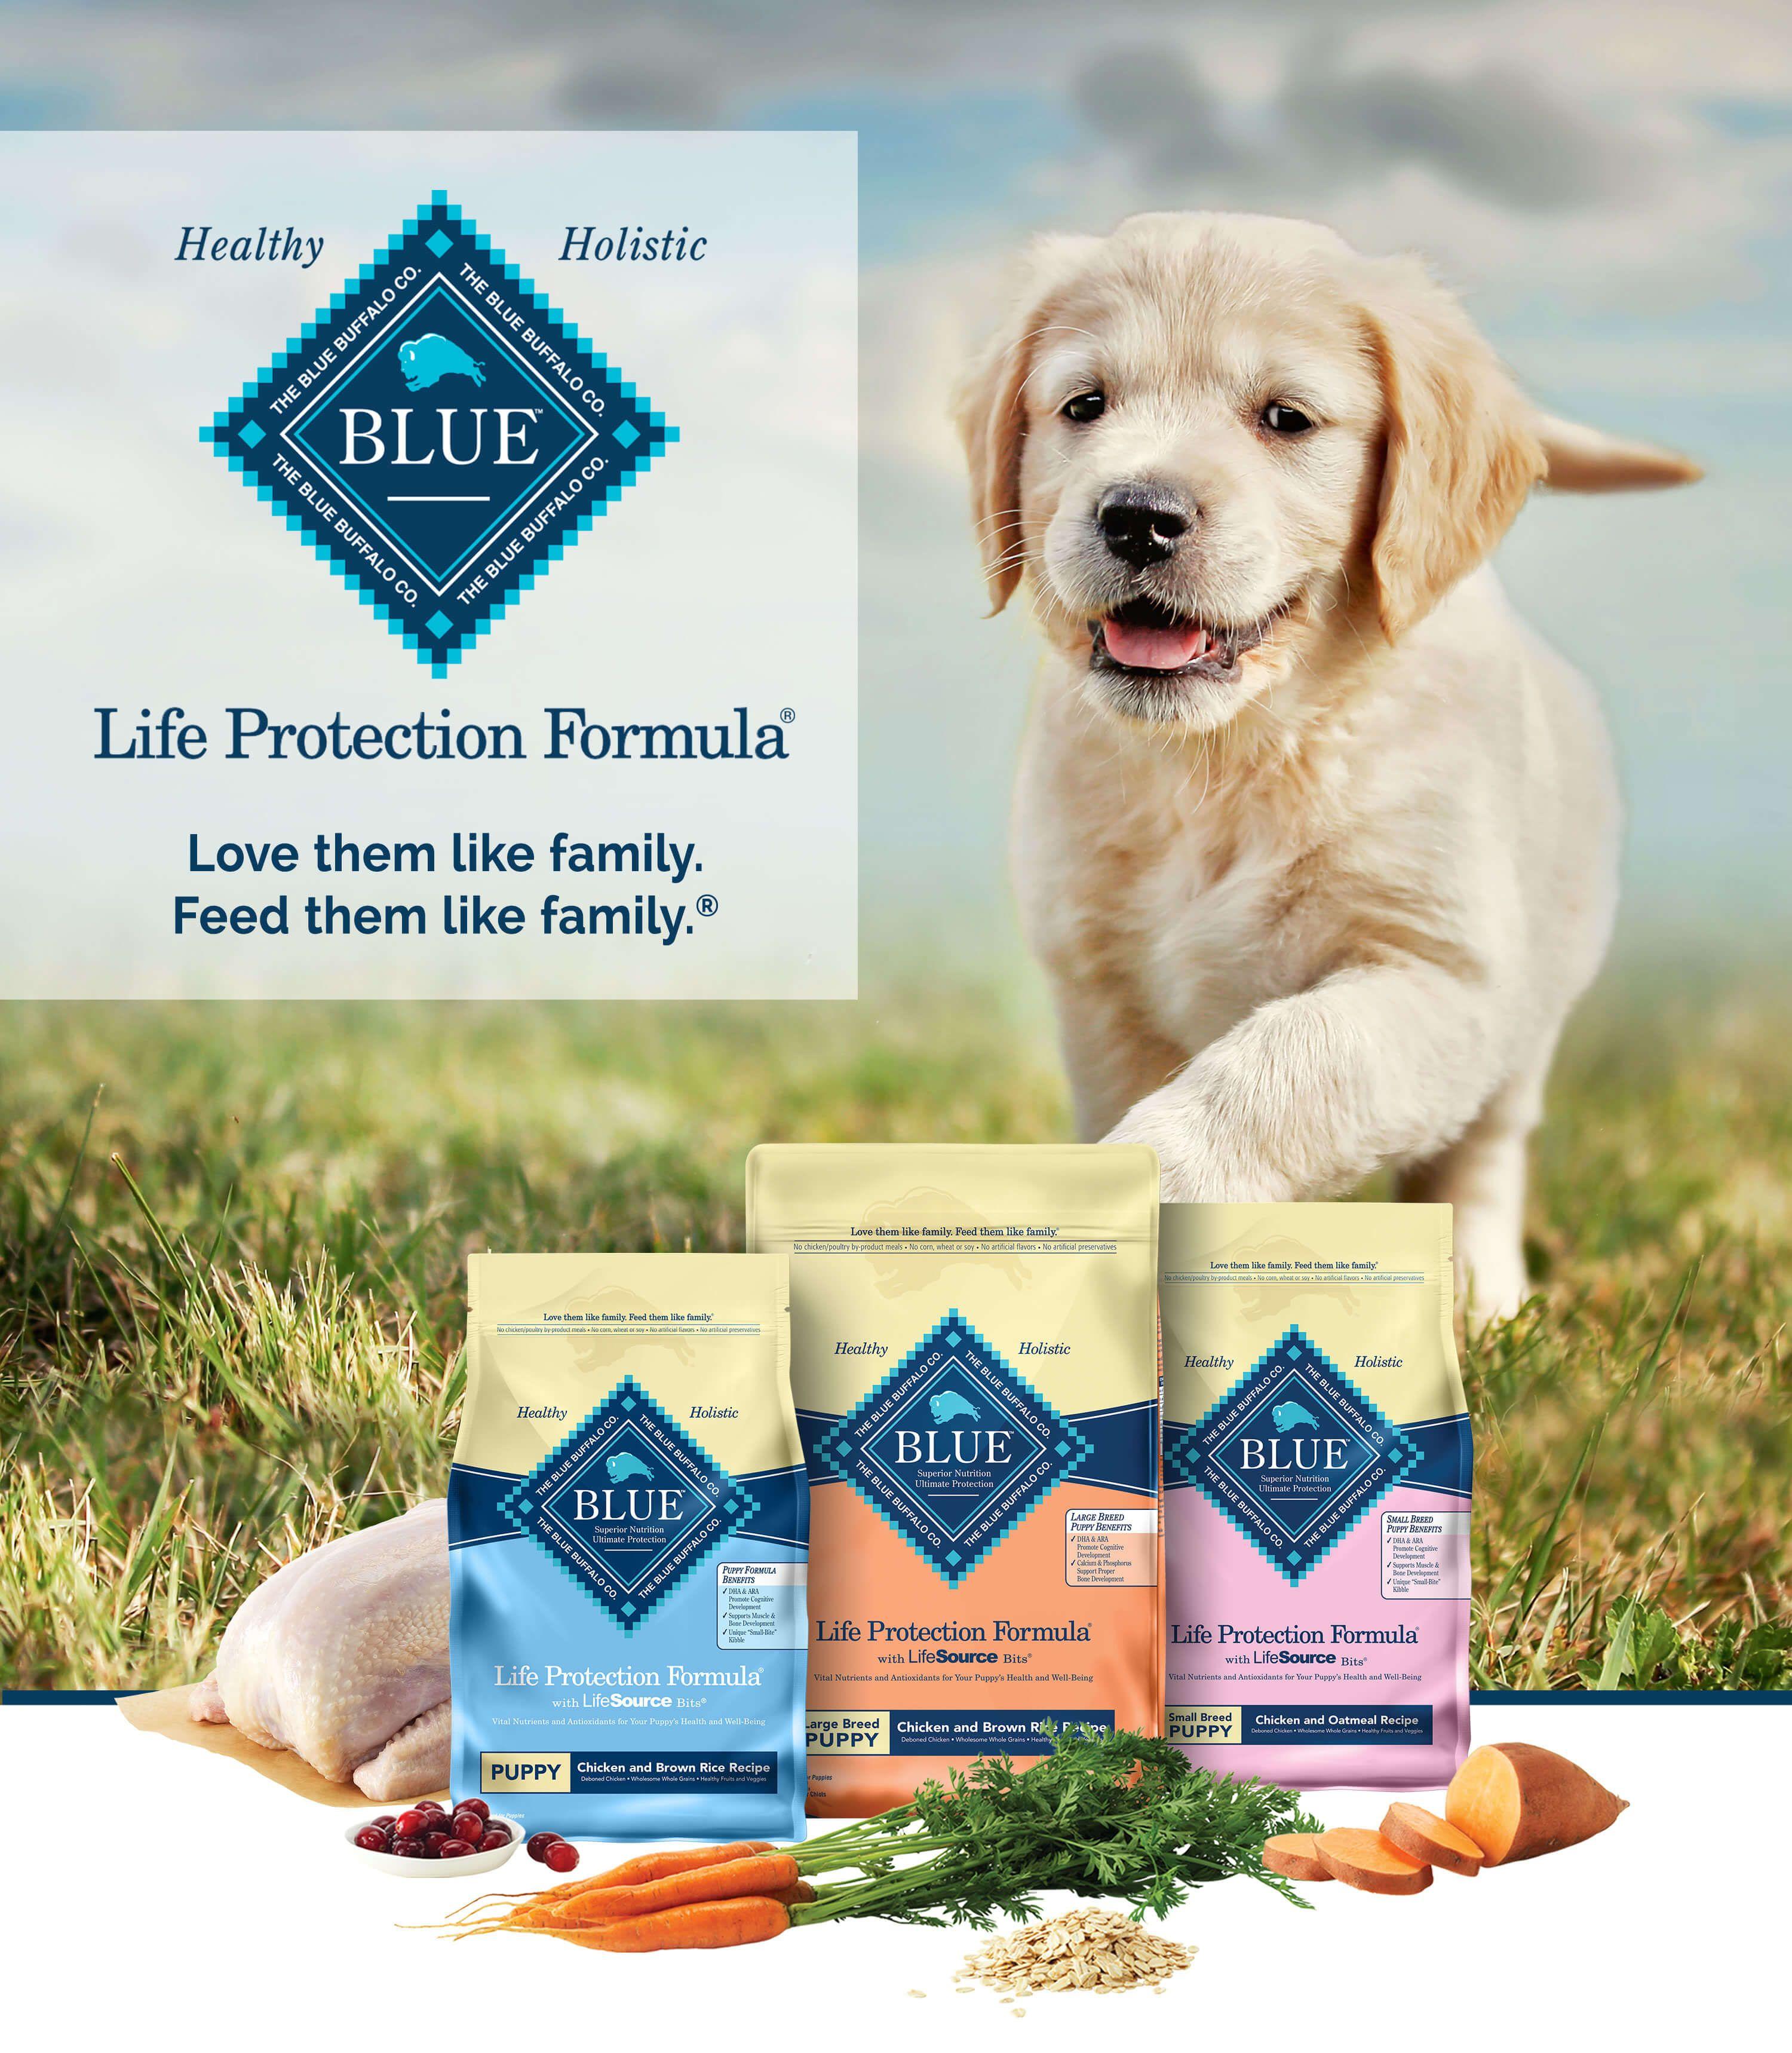 Blue buffalo life protection formula puppy food chicken